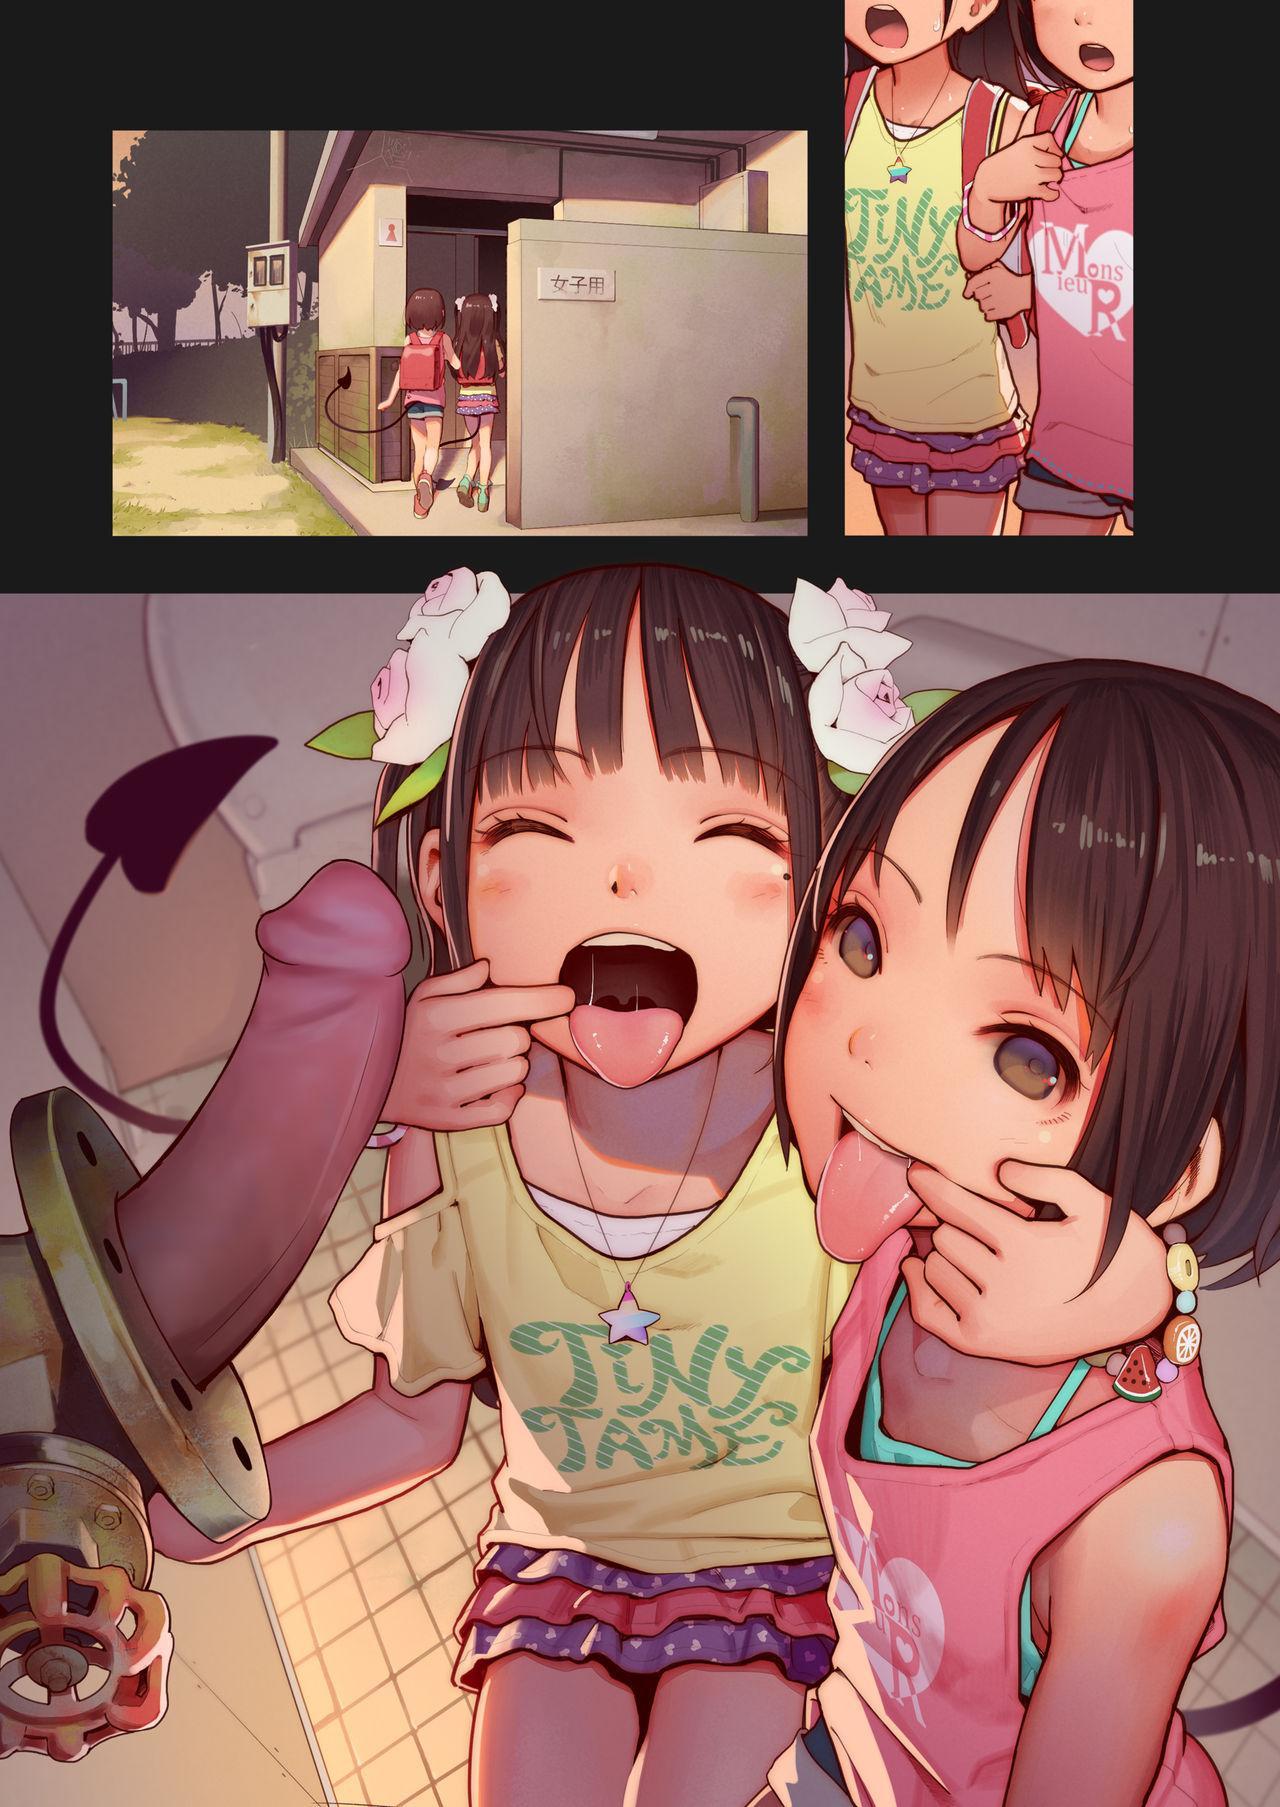 [MonsieuR (MUK)] Tiny Evil chans! 2 -Mujaki de Zankoku na Shoujo-tachi no Ecchi na Tanpenshuu- [English] {Hennojin} [Decensored] [Digital] 24